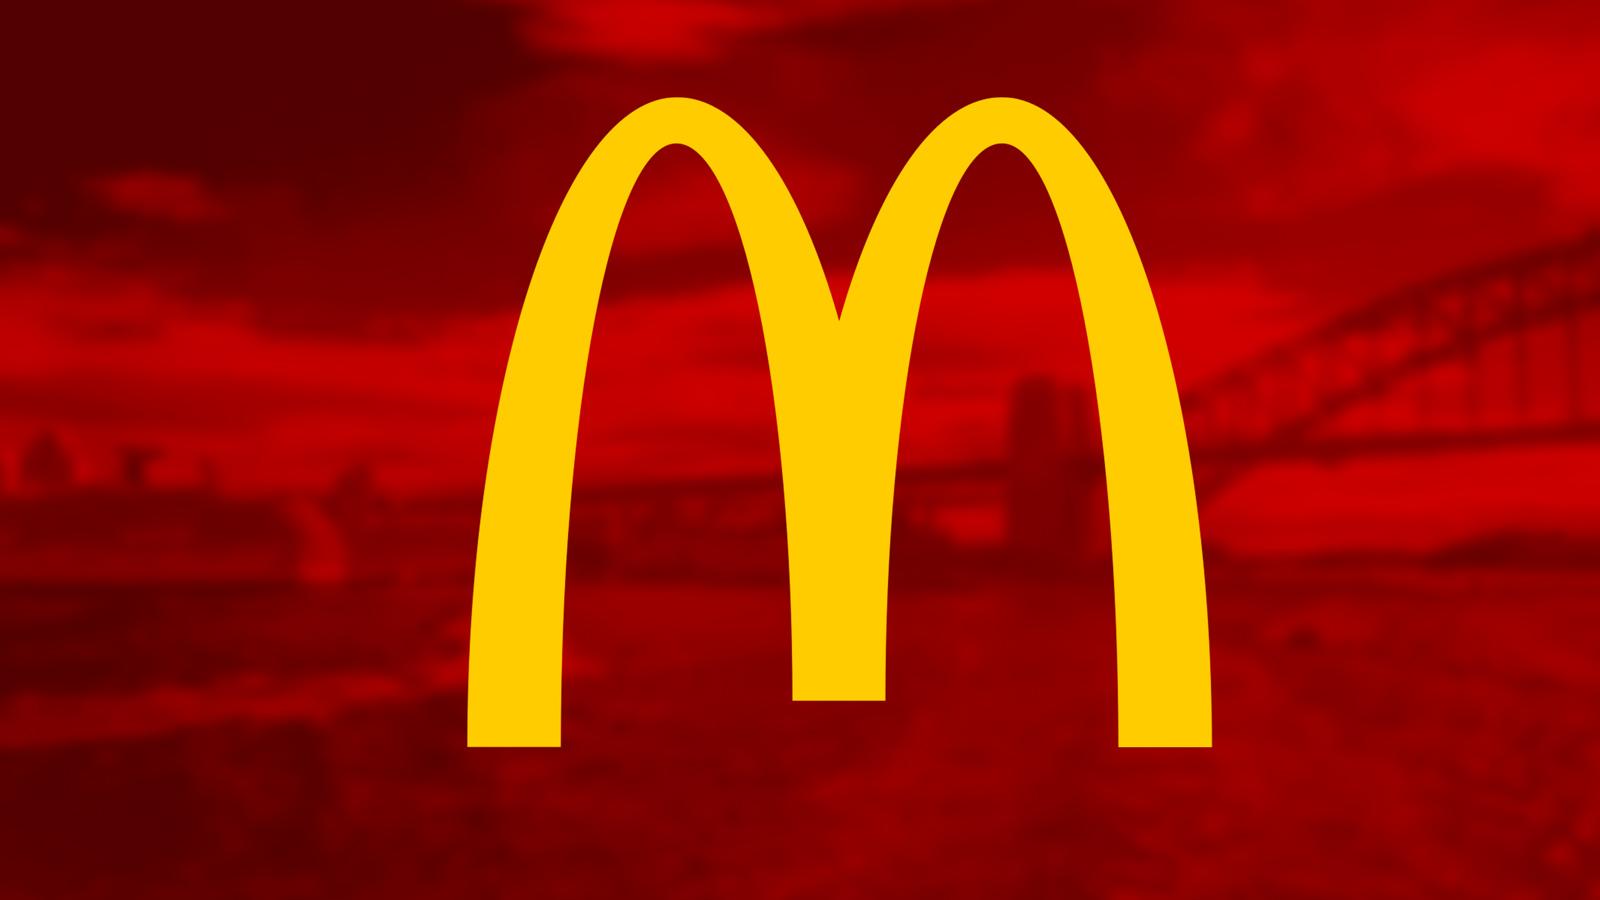 MacDonald's Australia